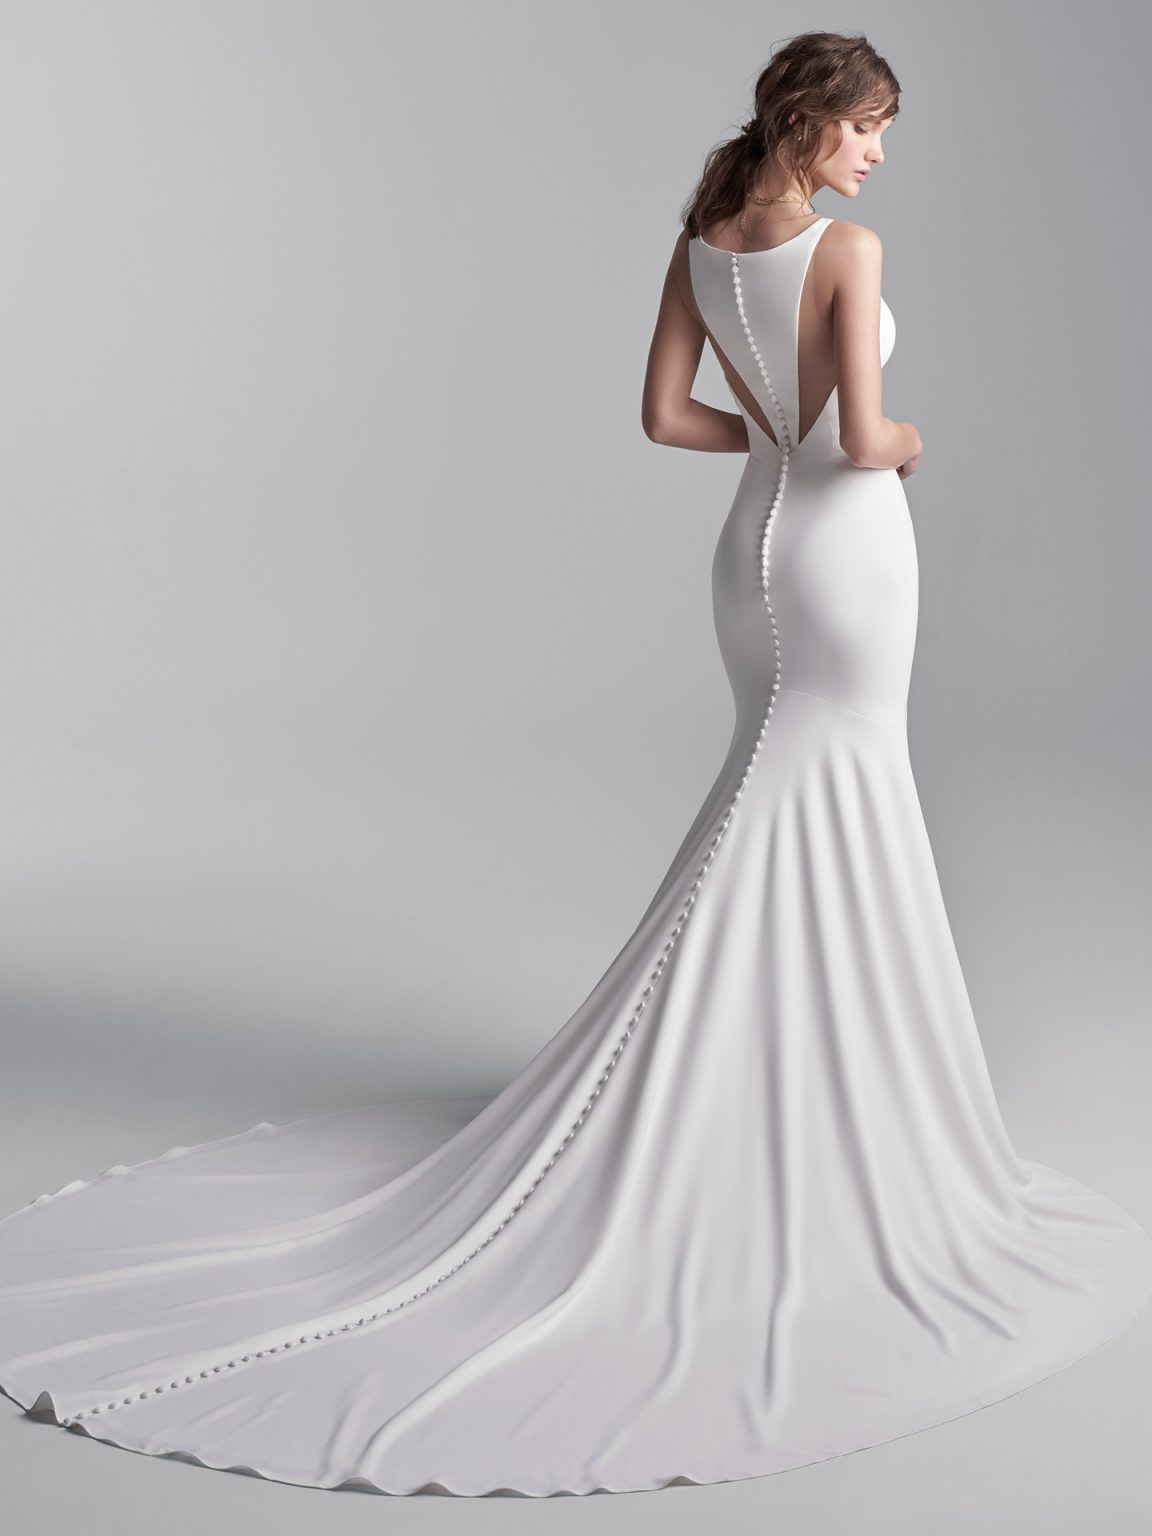 Simple Halter Back Mermaid Wedding Dress Kleinfeld Bridal In 2021 Plain Wedding Dress Wedding Dresses Kleinfeld Modern Wedding Dress [ 1536 x 1152 Pixel ]